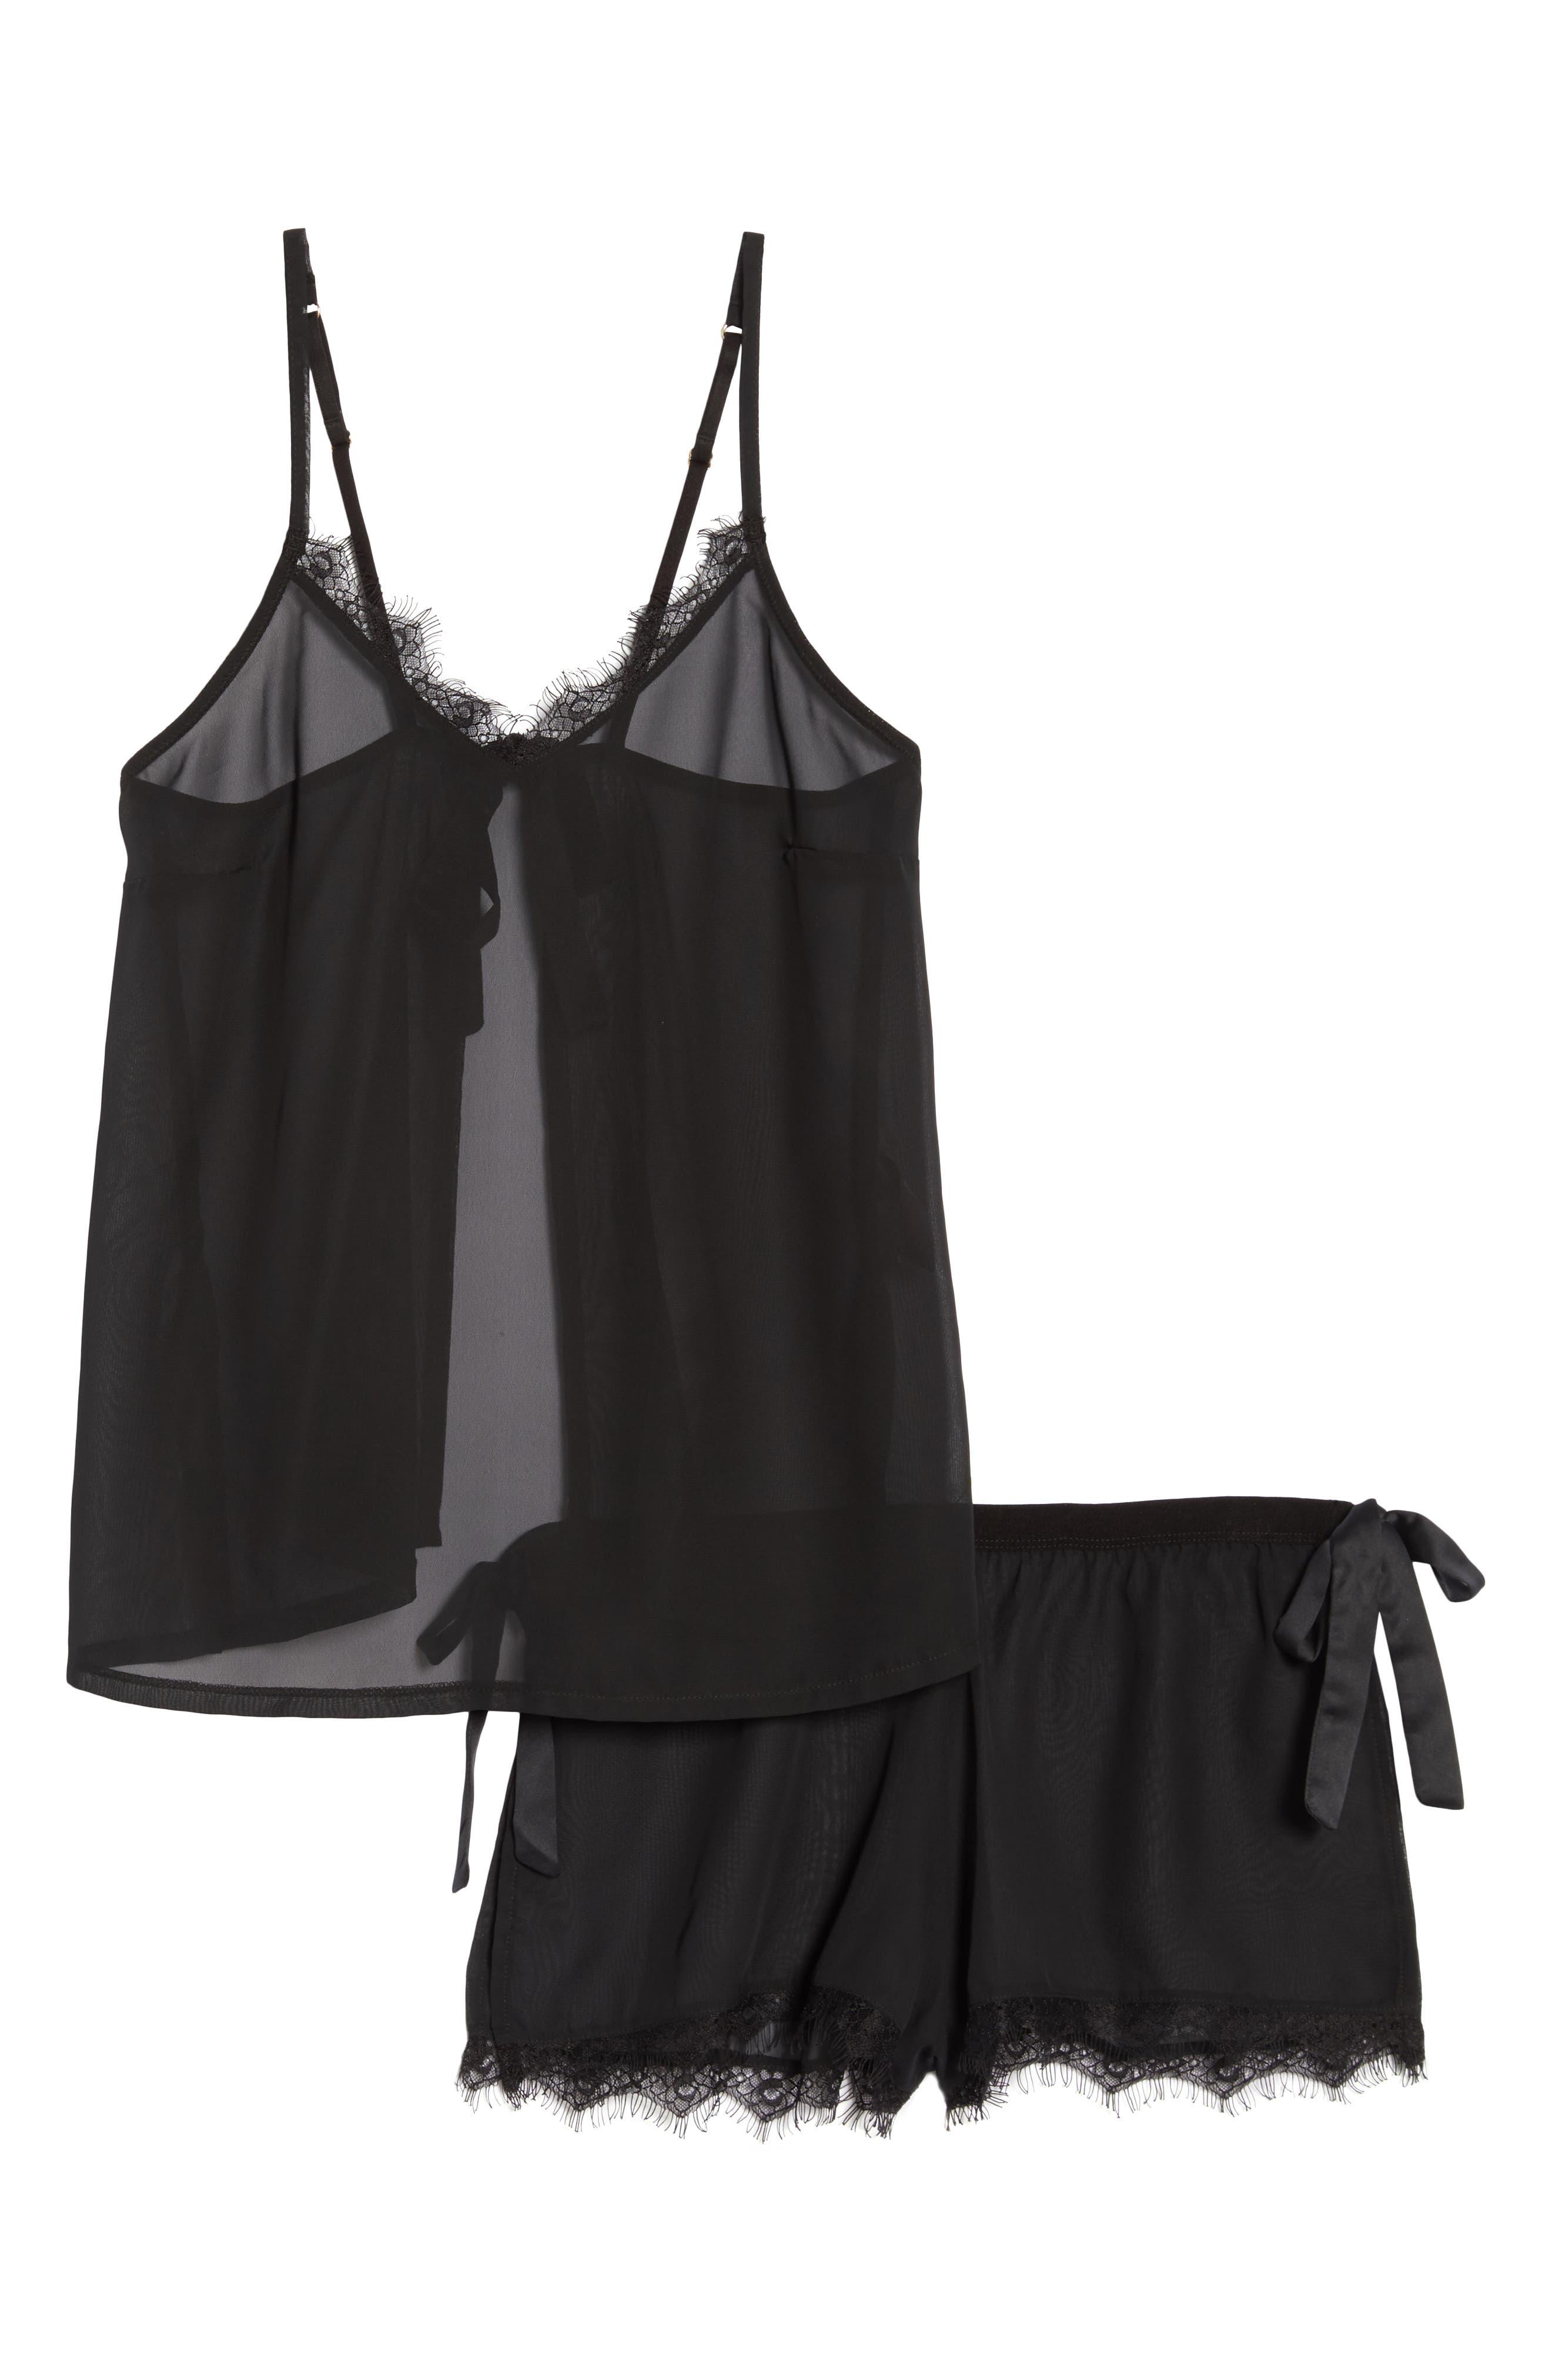 Copper Sheer Short Pajamas,                             Alternate thumbnail 6, color,                             BLACK